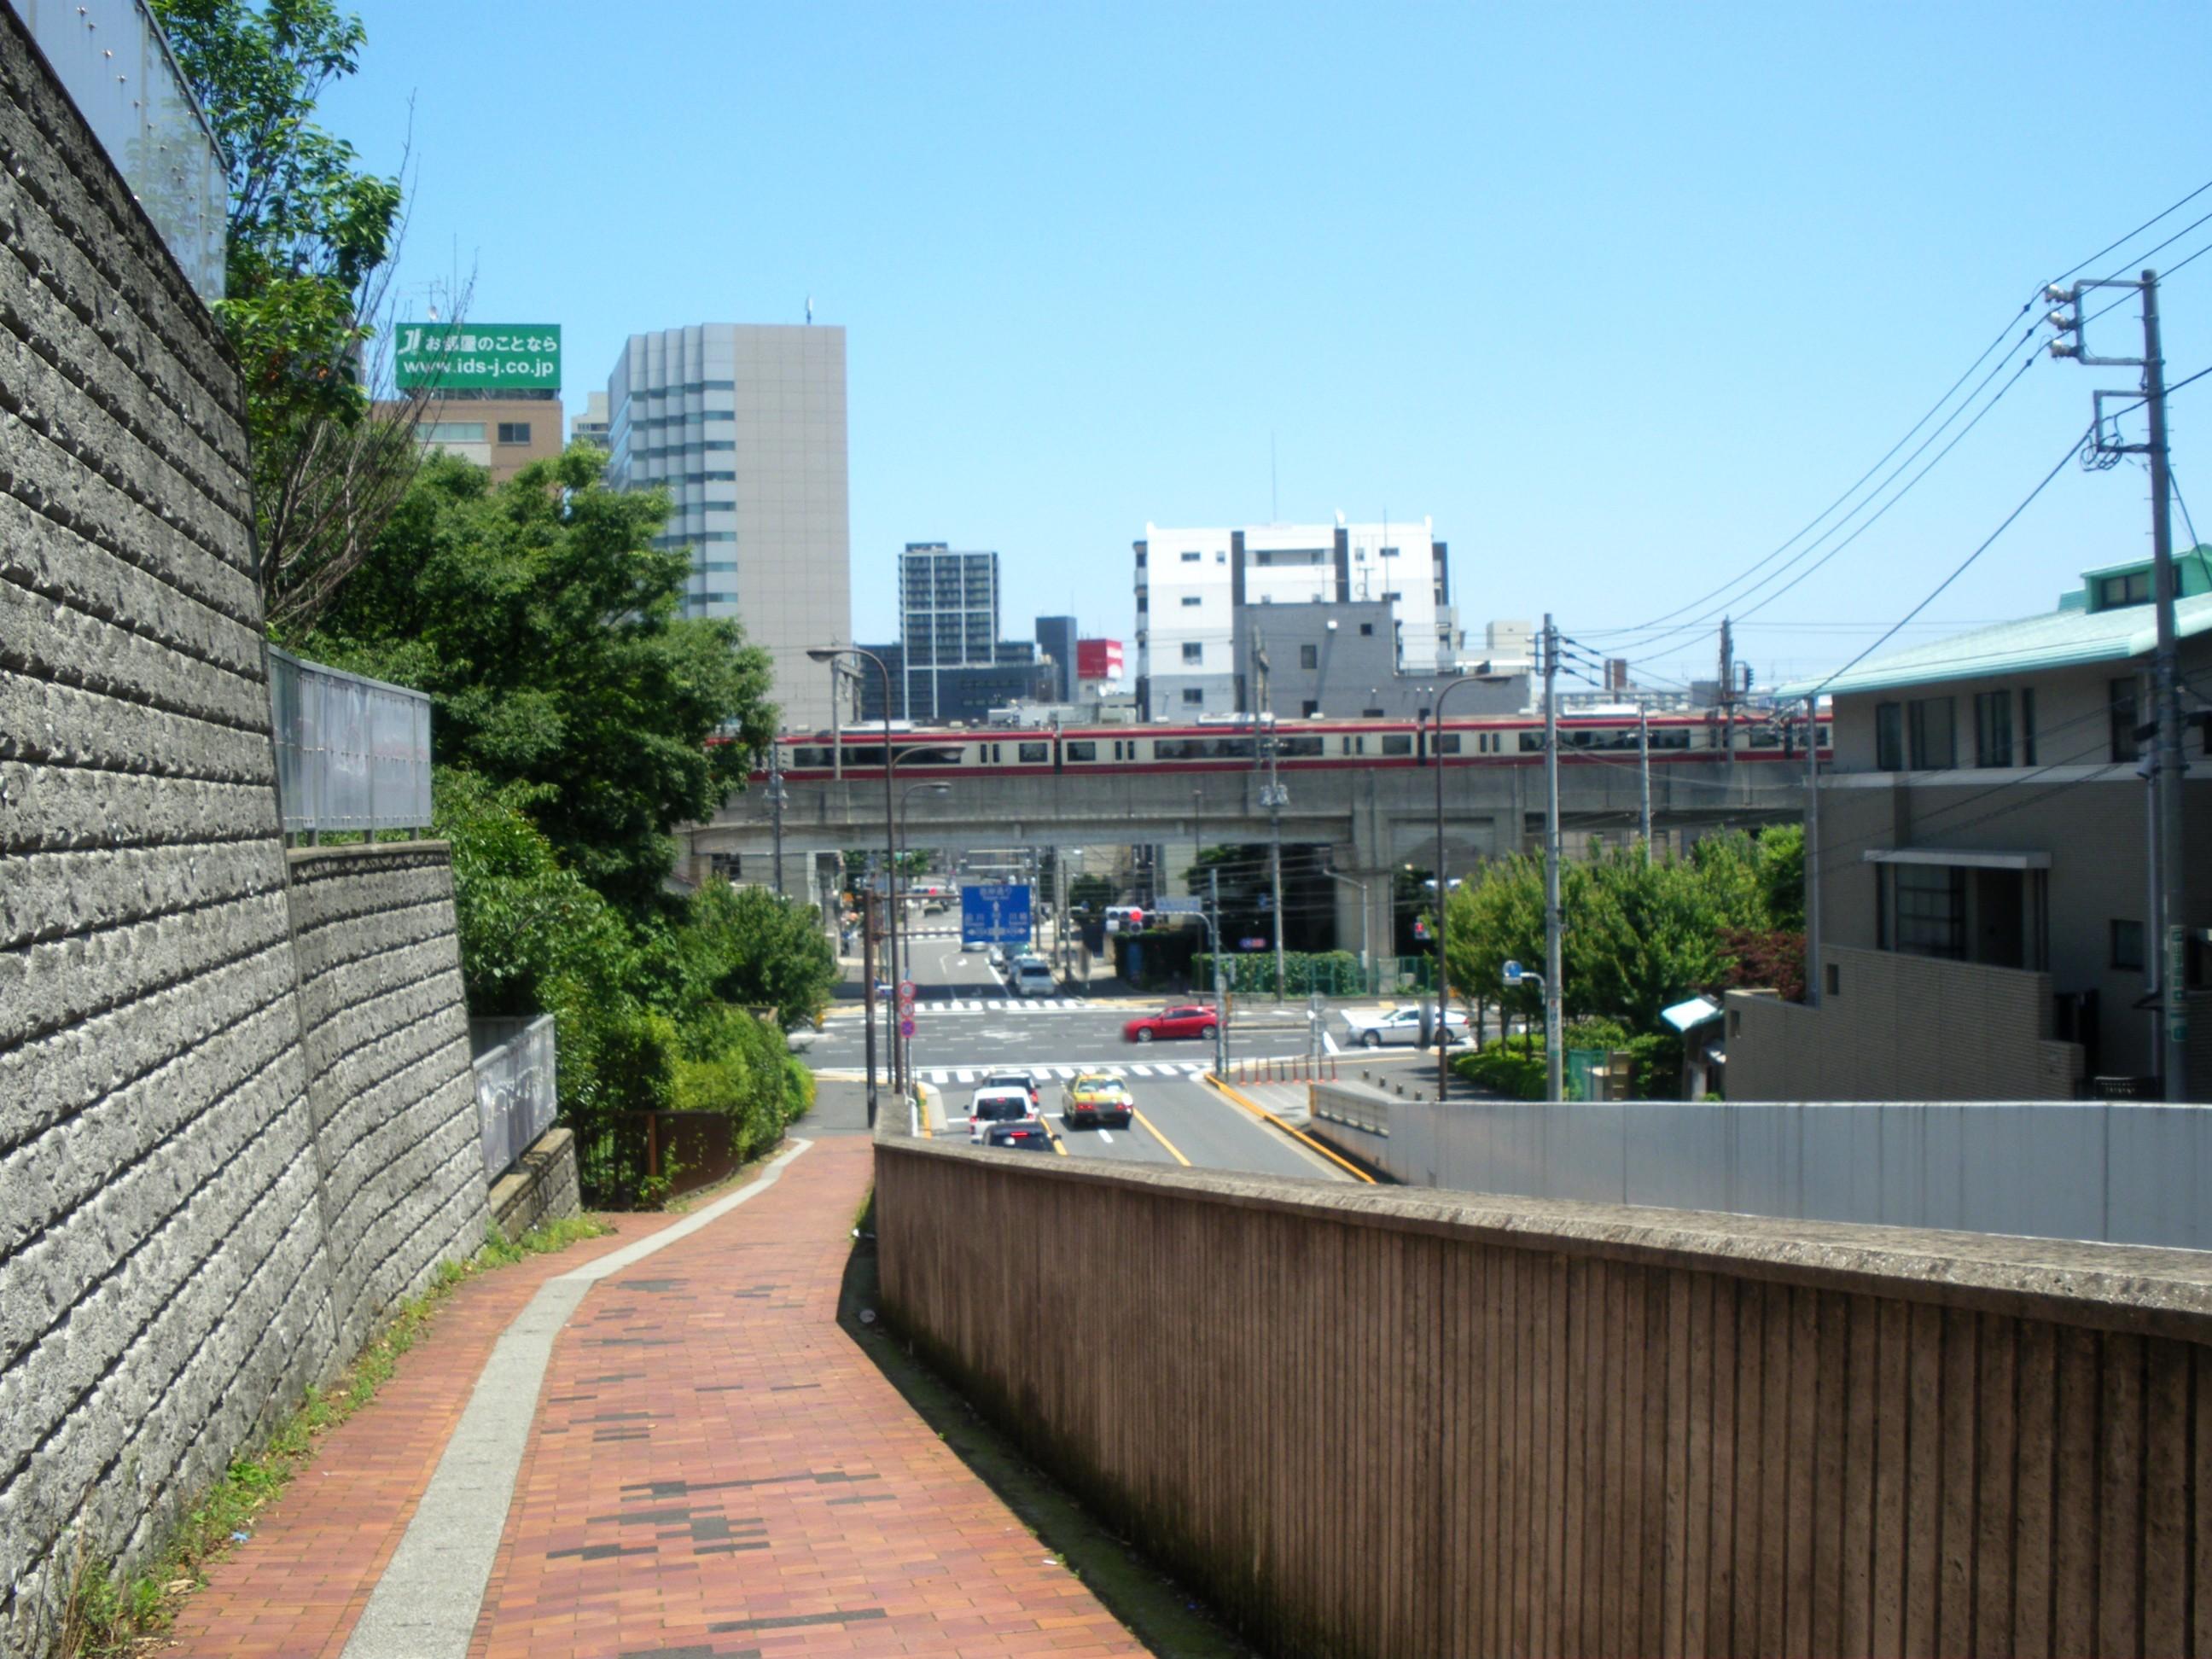 File:Sendai slope oi shinagawa tokyo 2009-2.JPG - Wikimedia Commons